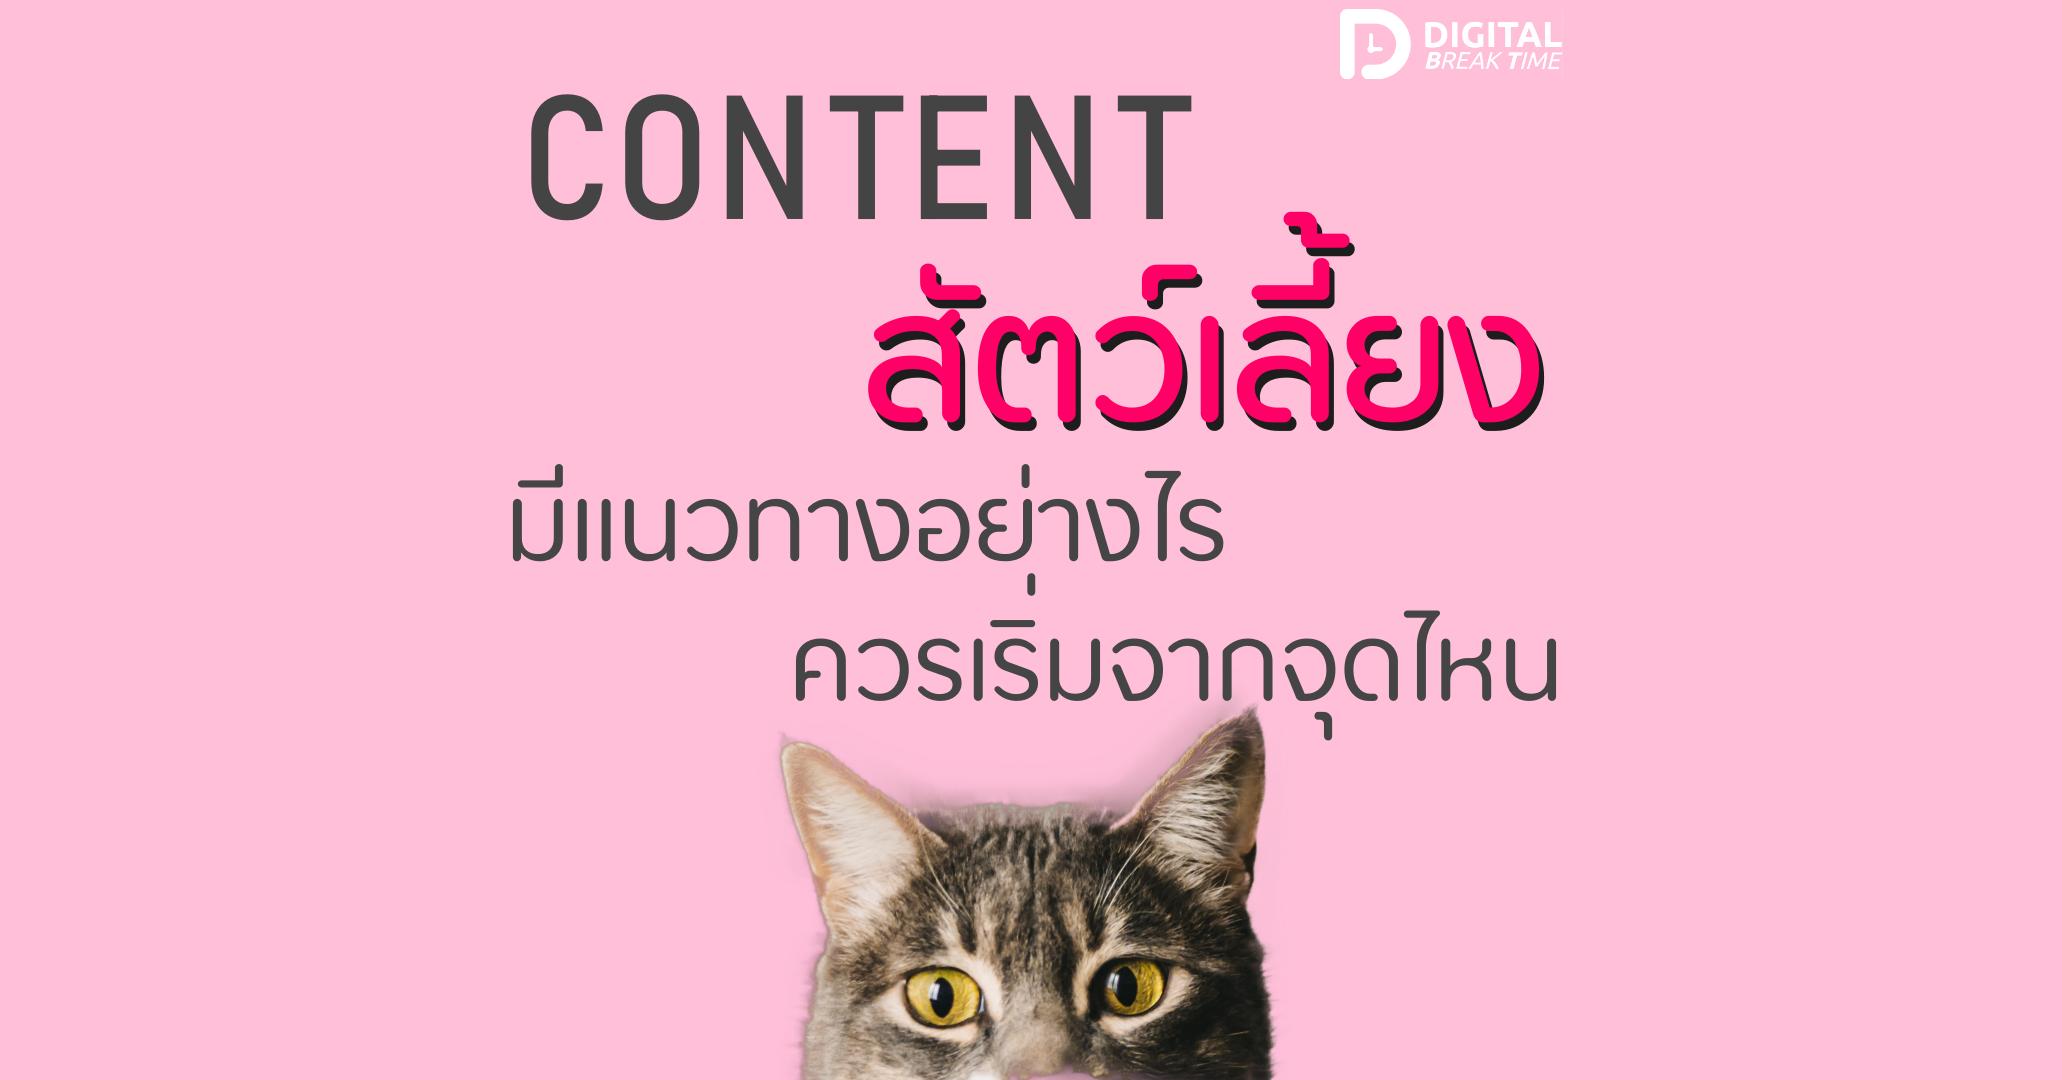 Content Marketing สัตว์เลี้ยง cover